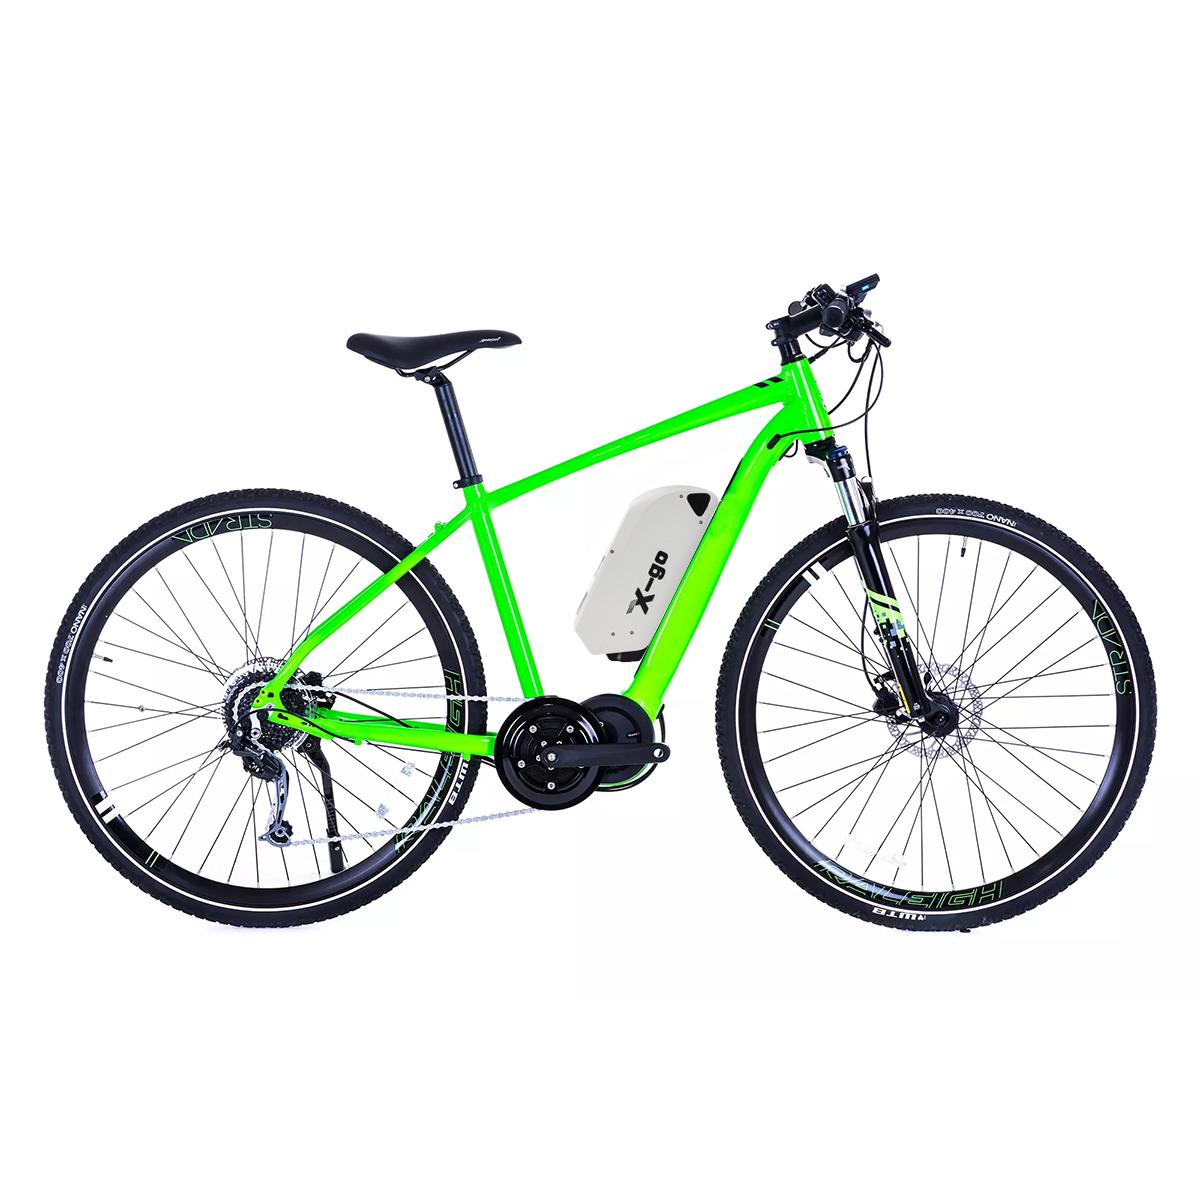 e bike akku 48v 12 5ah lithium ionen e fahrrad pedelec. Black Bedroom Furniture Sets. Home Design Ideas